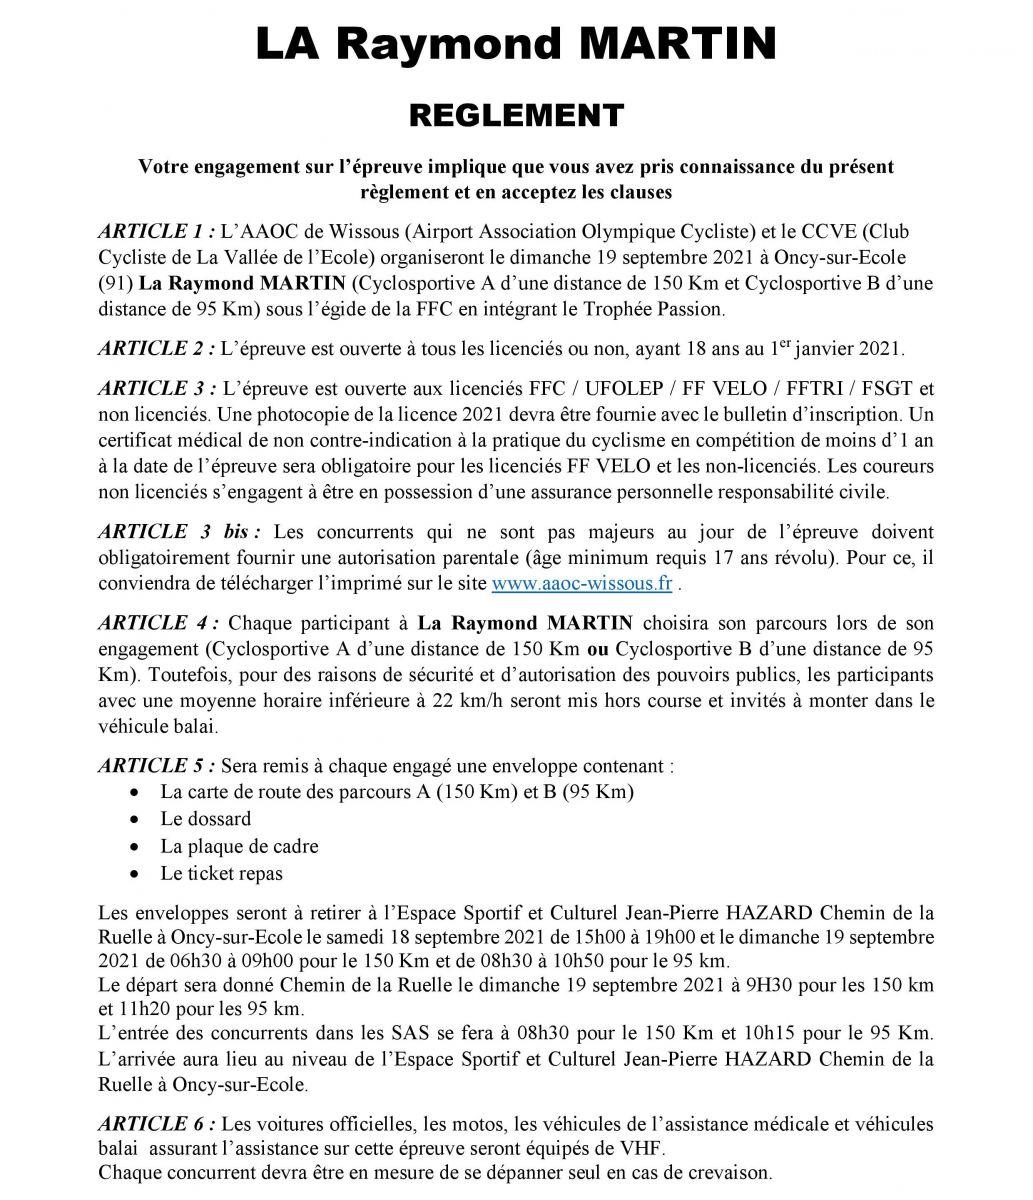 Reglement de La Raymond Martin 2021-page-001